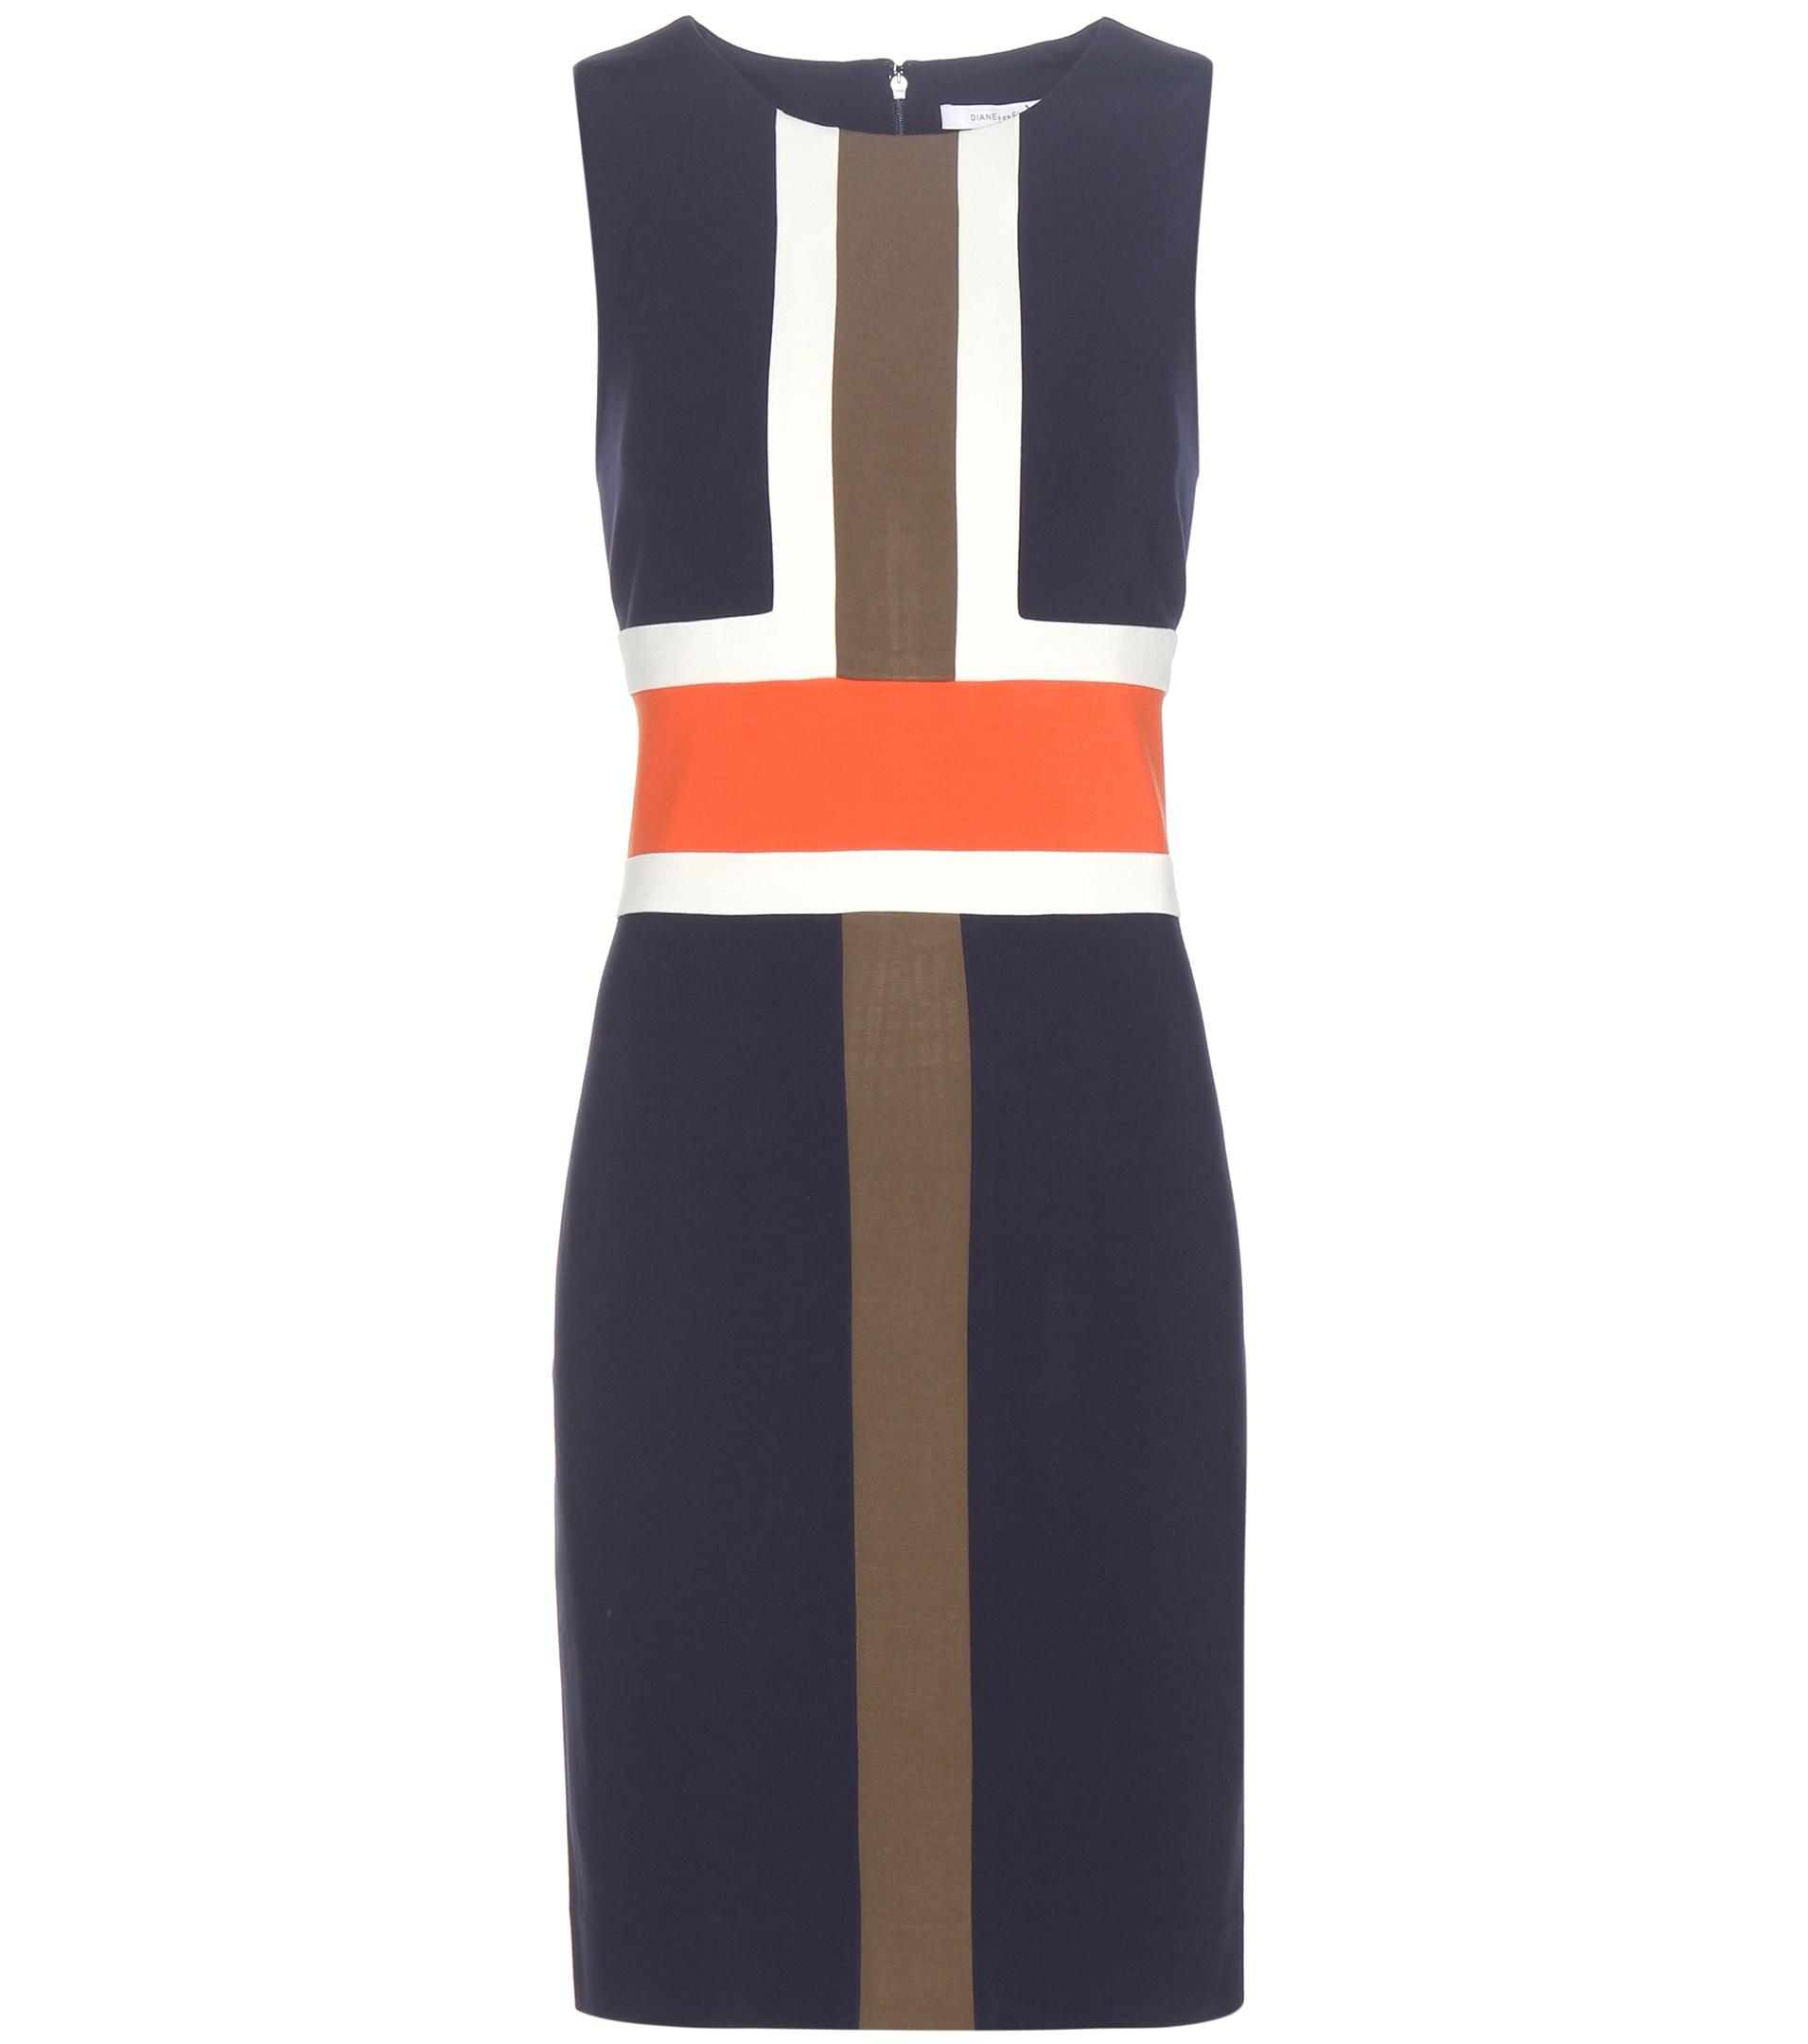 diane von furstenberg hazeline jersey dress in blue lyst. Black Bedroom Furniture Sets. Home Design Ideas